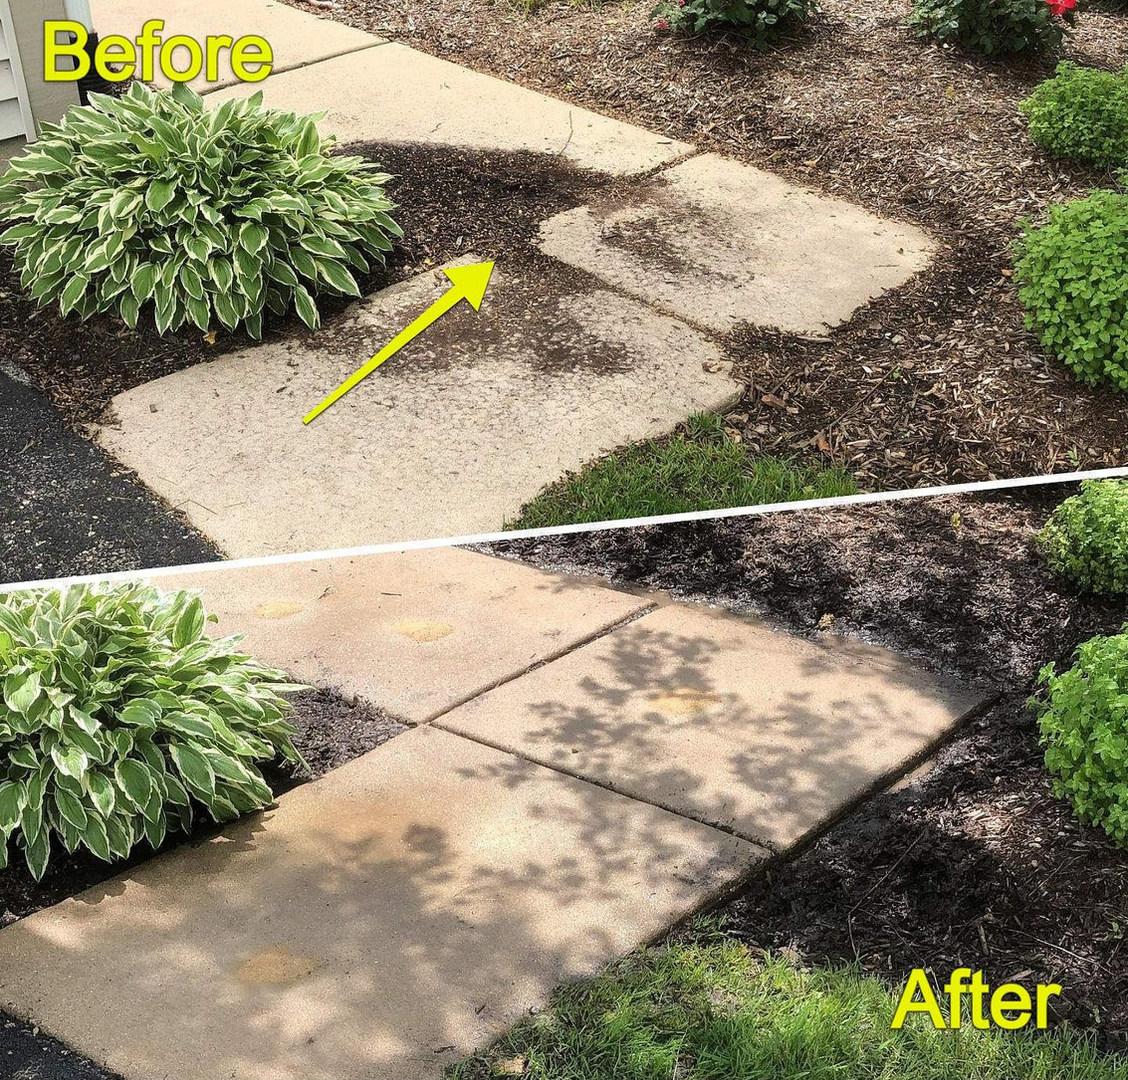 Raising Concrete Sidewalks, Eliminating Tripping Hazad, and Water Pooling